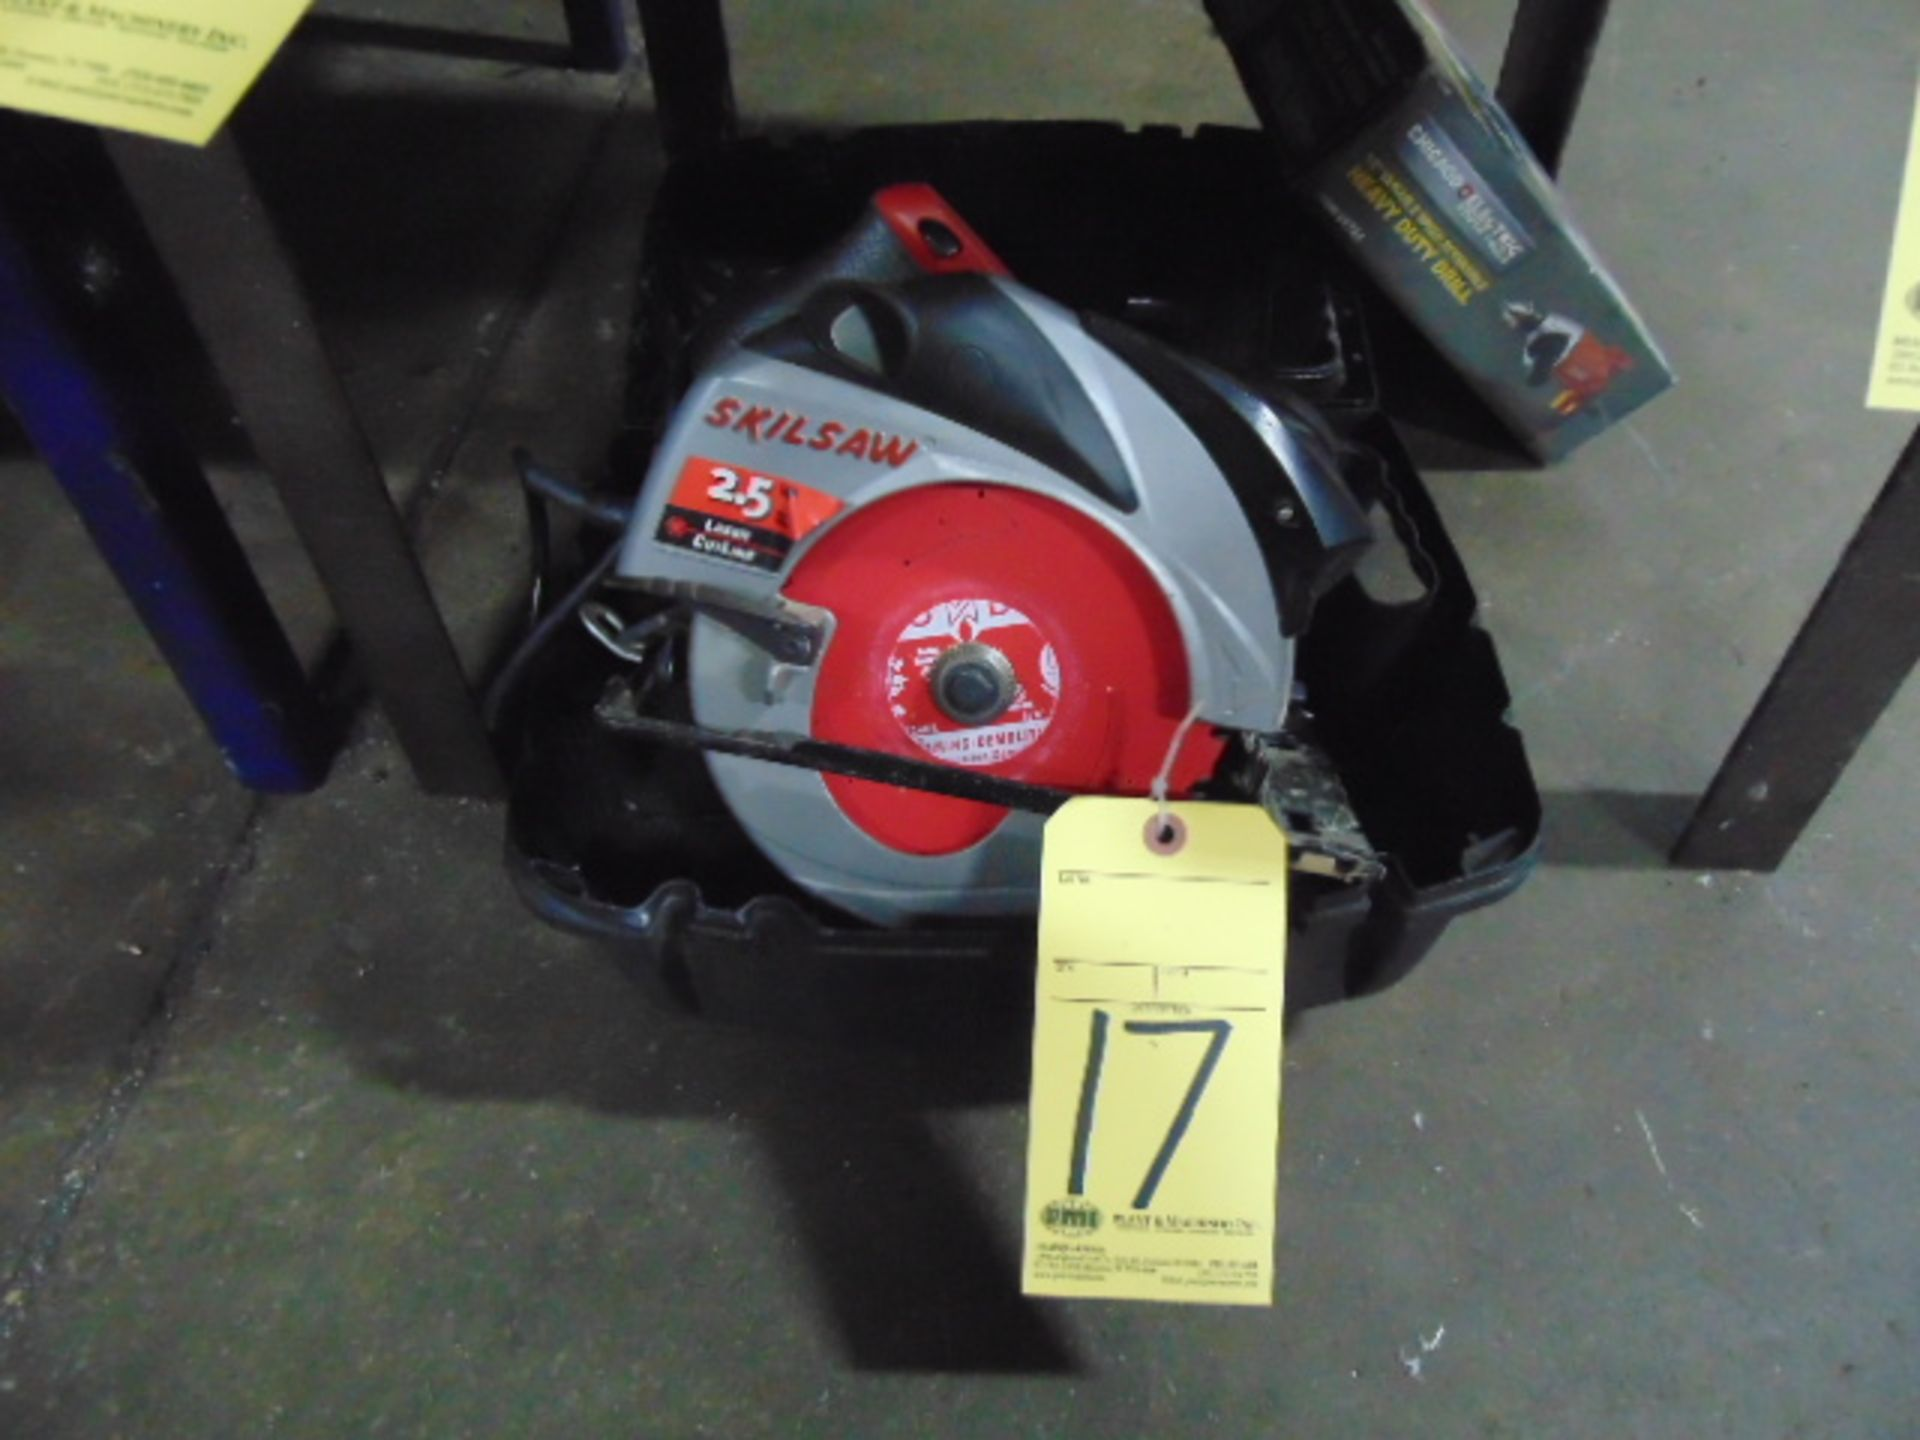 "Lot 17 - CIRCULAR SAW, SKILSAW, 2-1/2 HP laser cutline, 7-1/4"" blade"